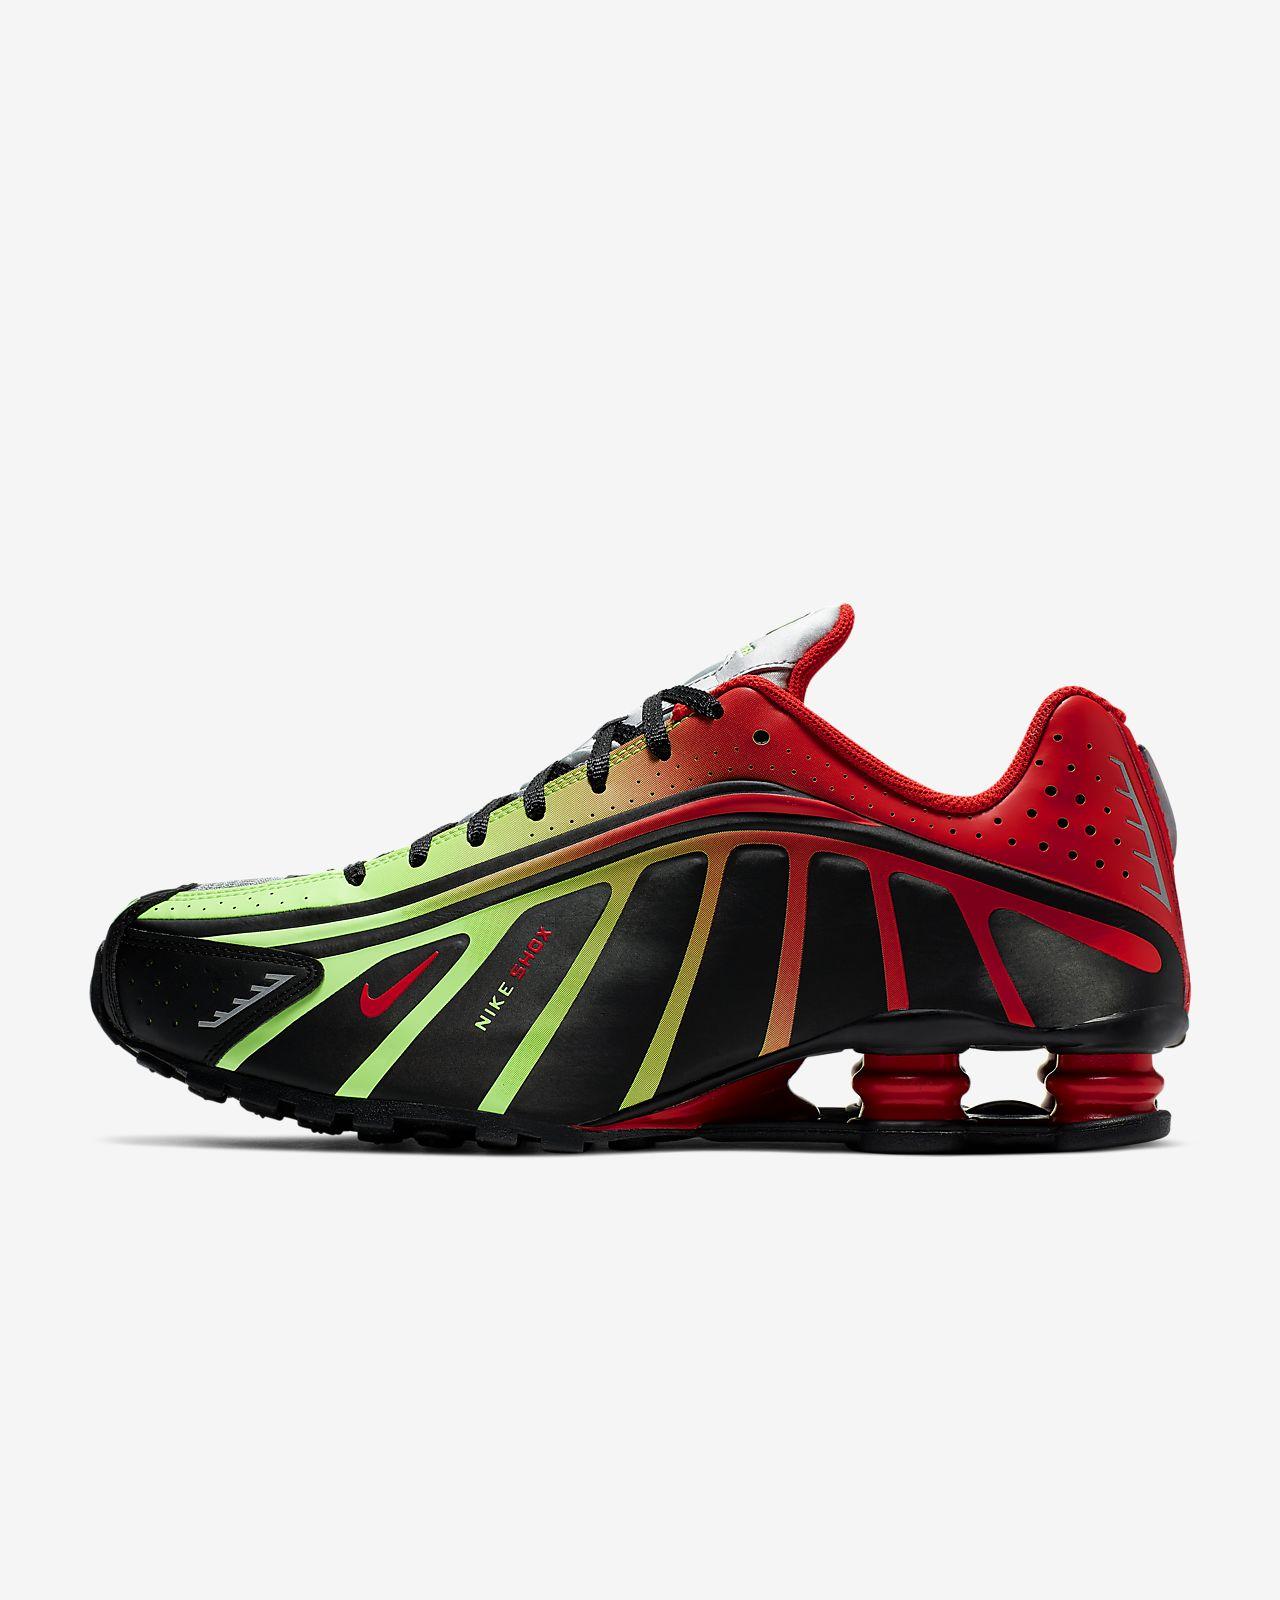 Nike Shox R4 Neymar Jr Schuh